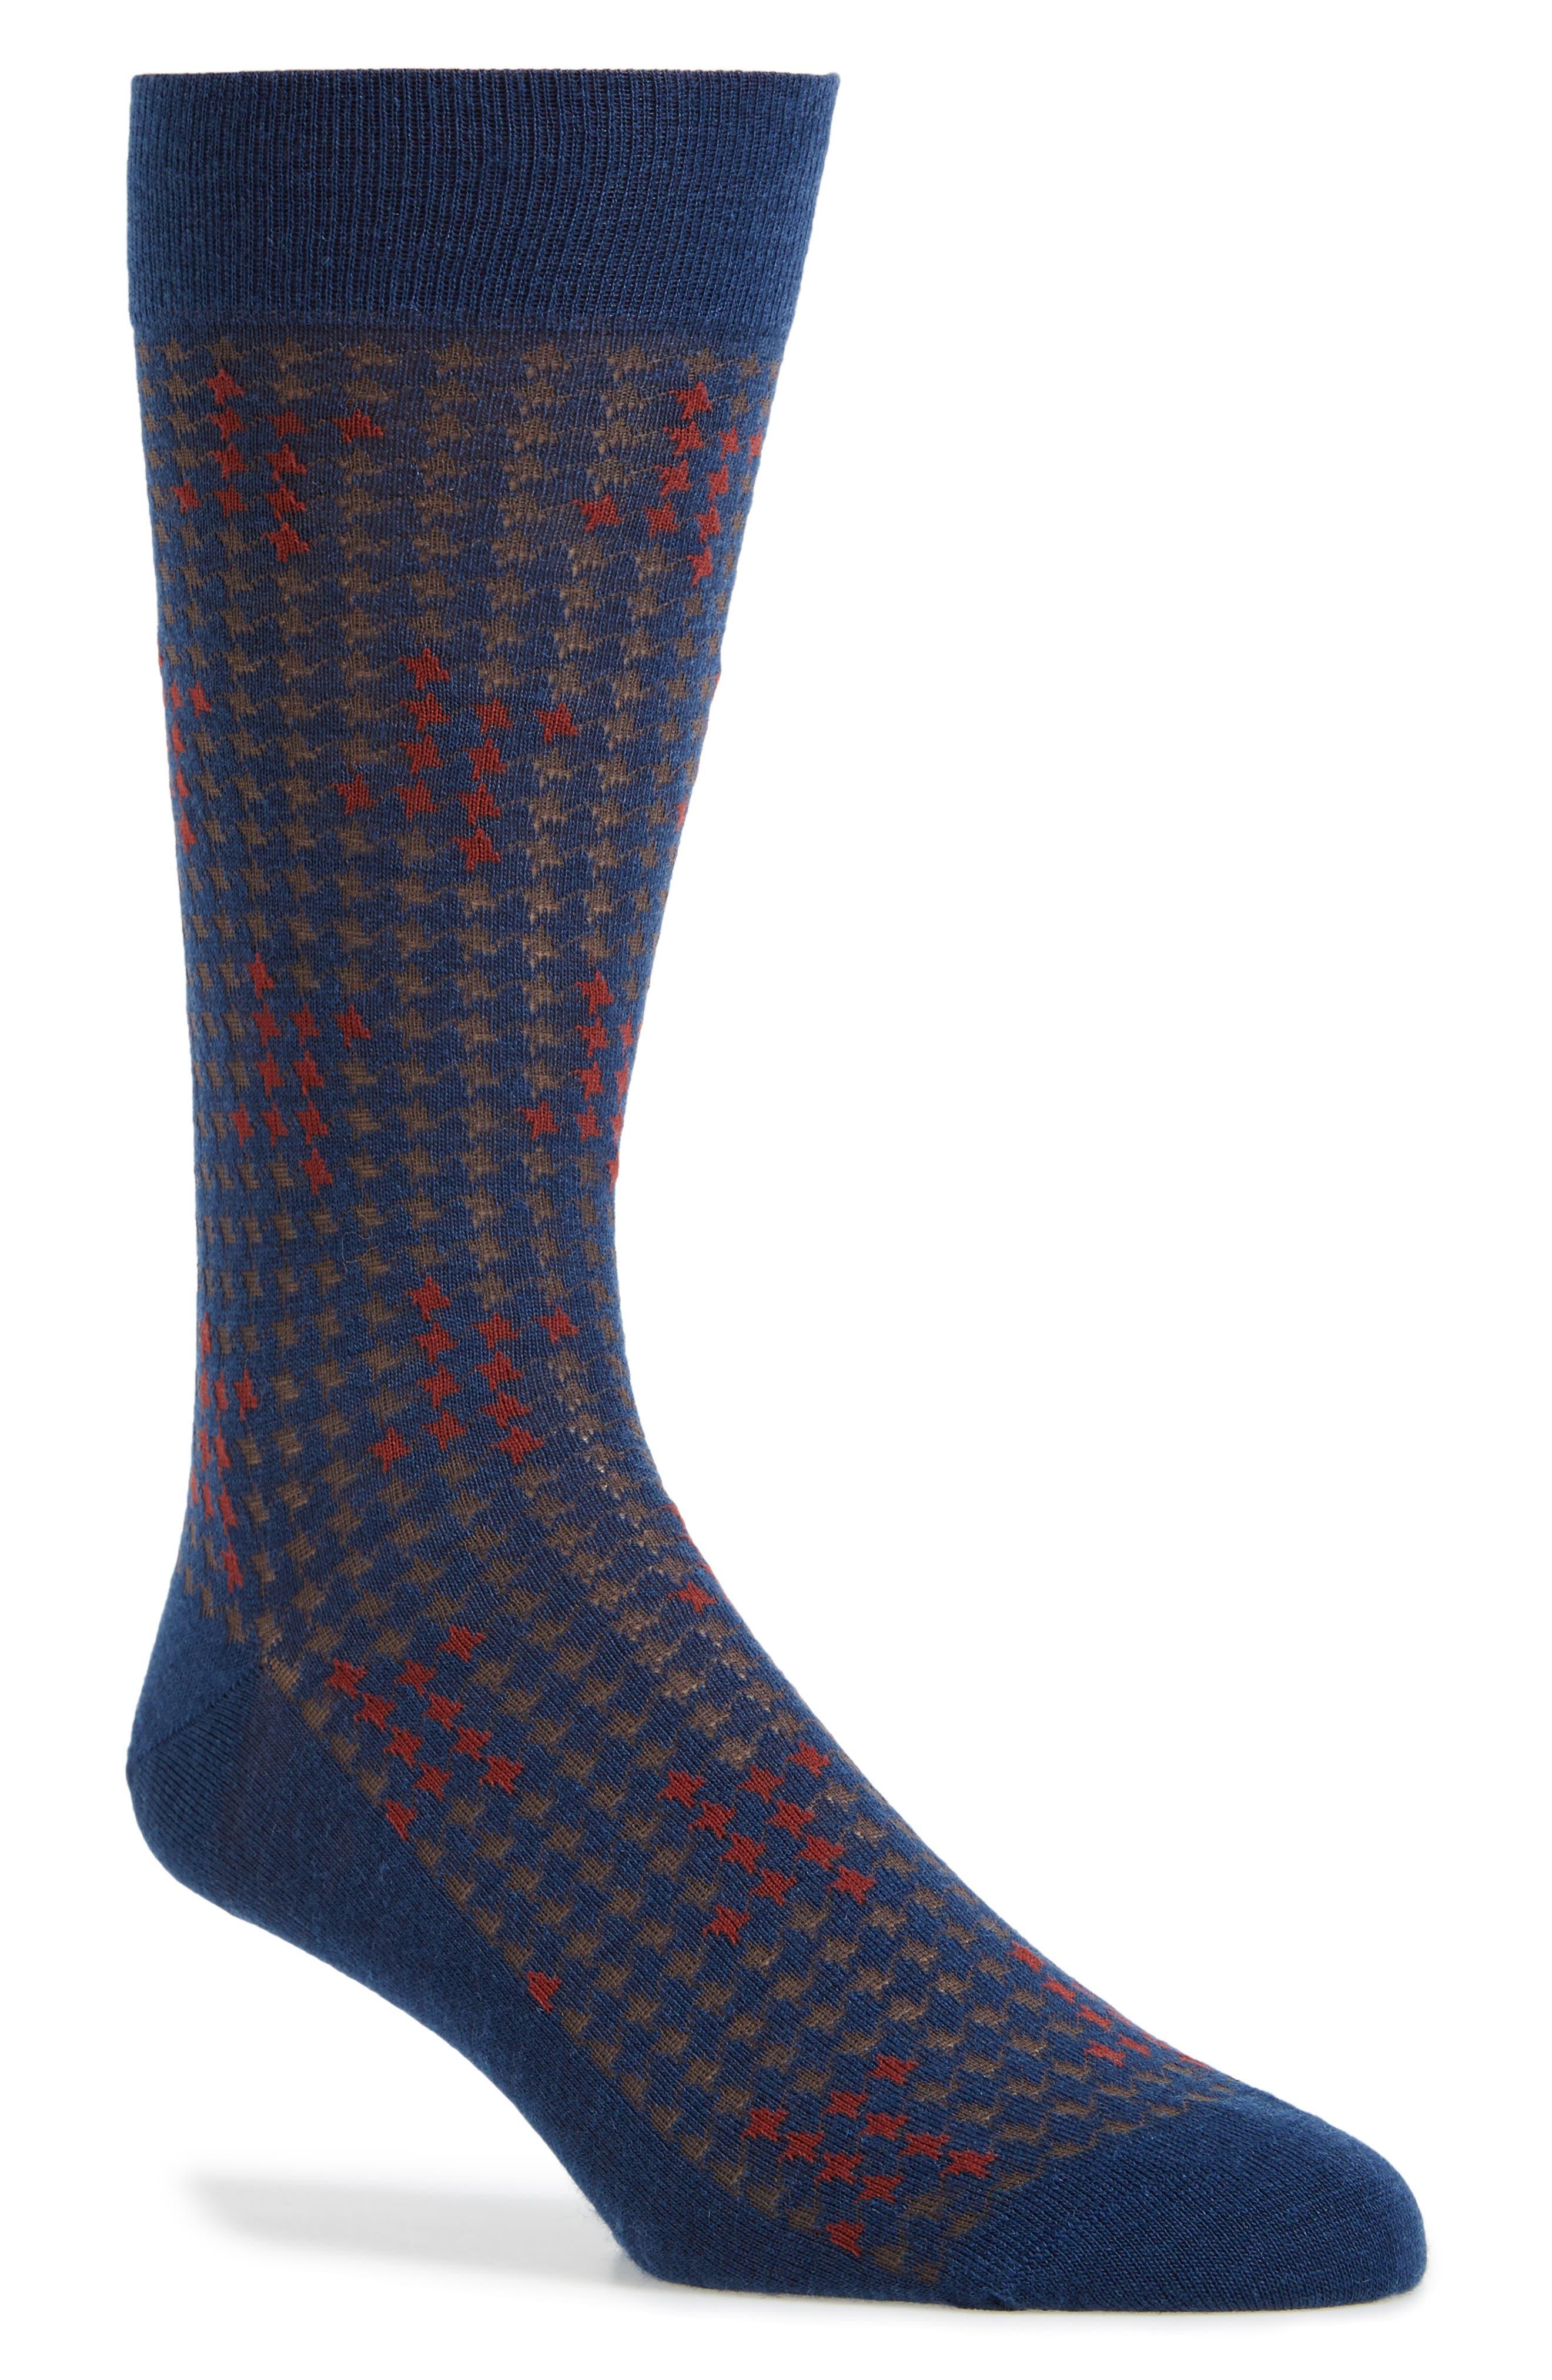 Pantherella Houndstooth Socks